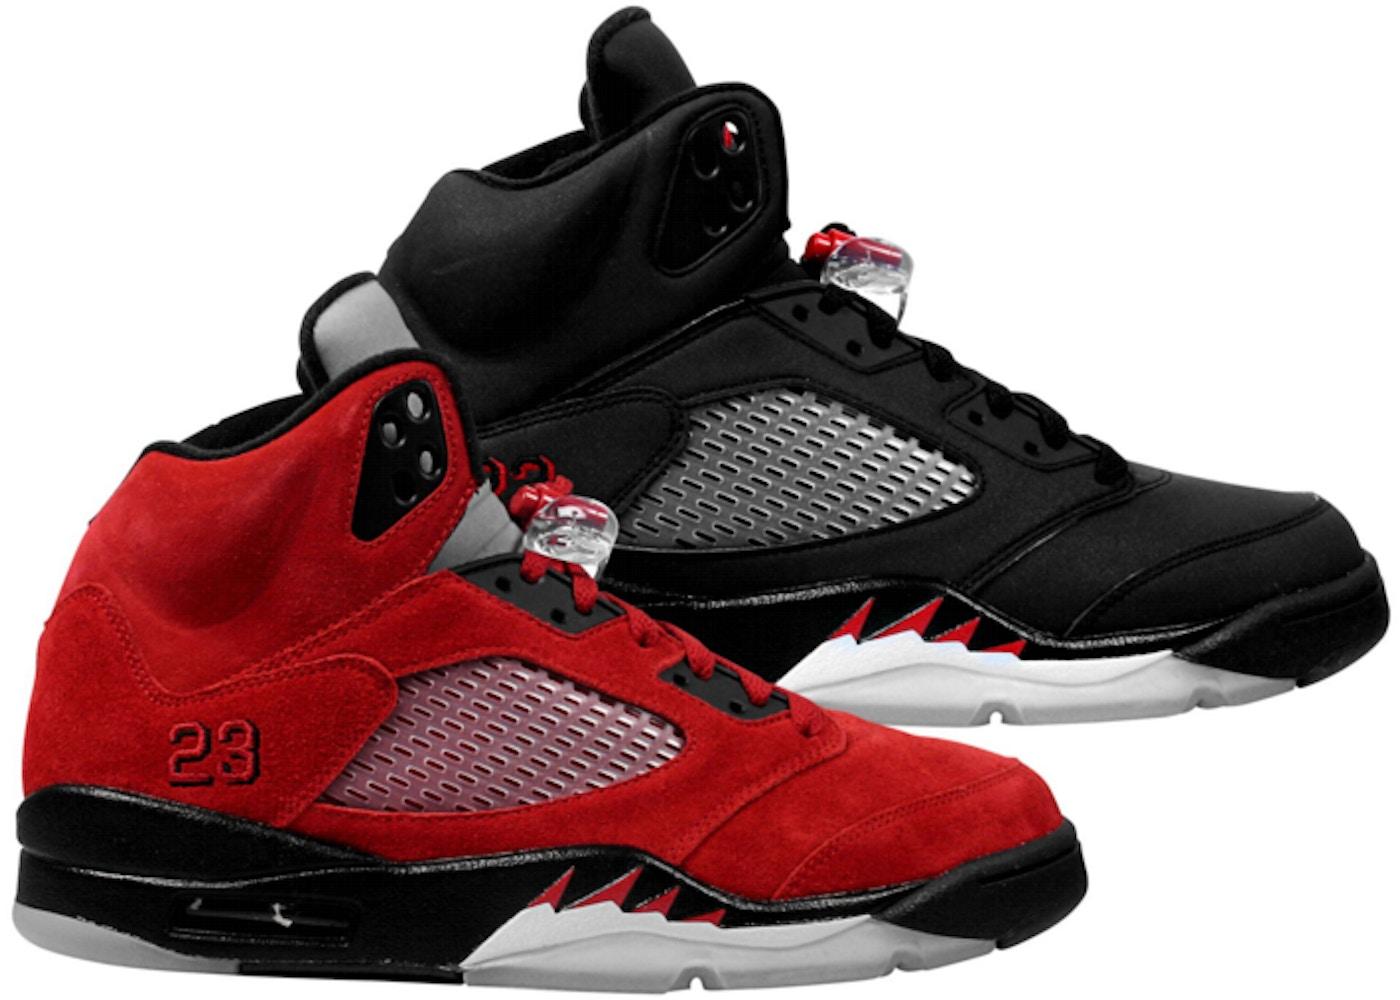 official photos 6fa42 7e5aa Air Jordan Packs Shoes - Release Date